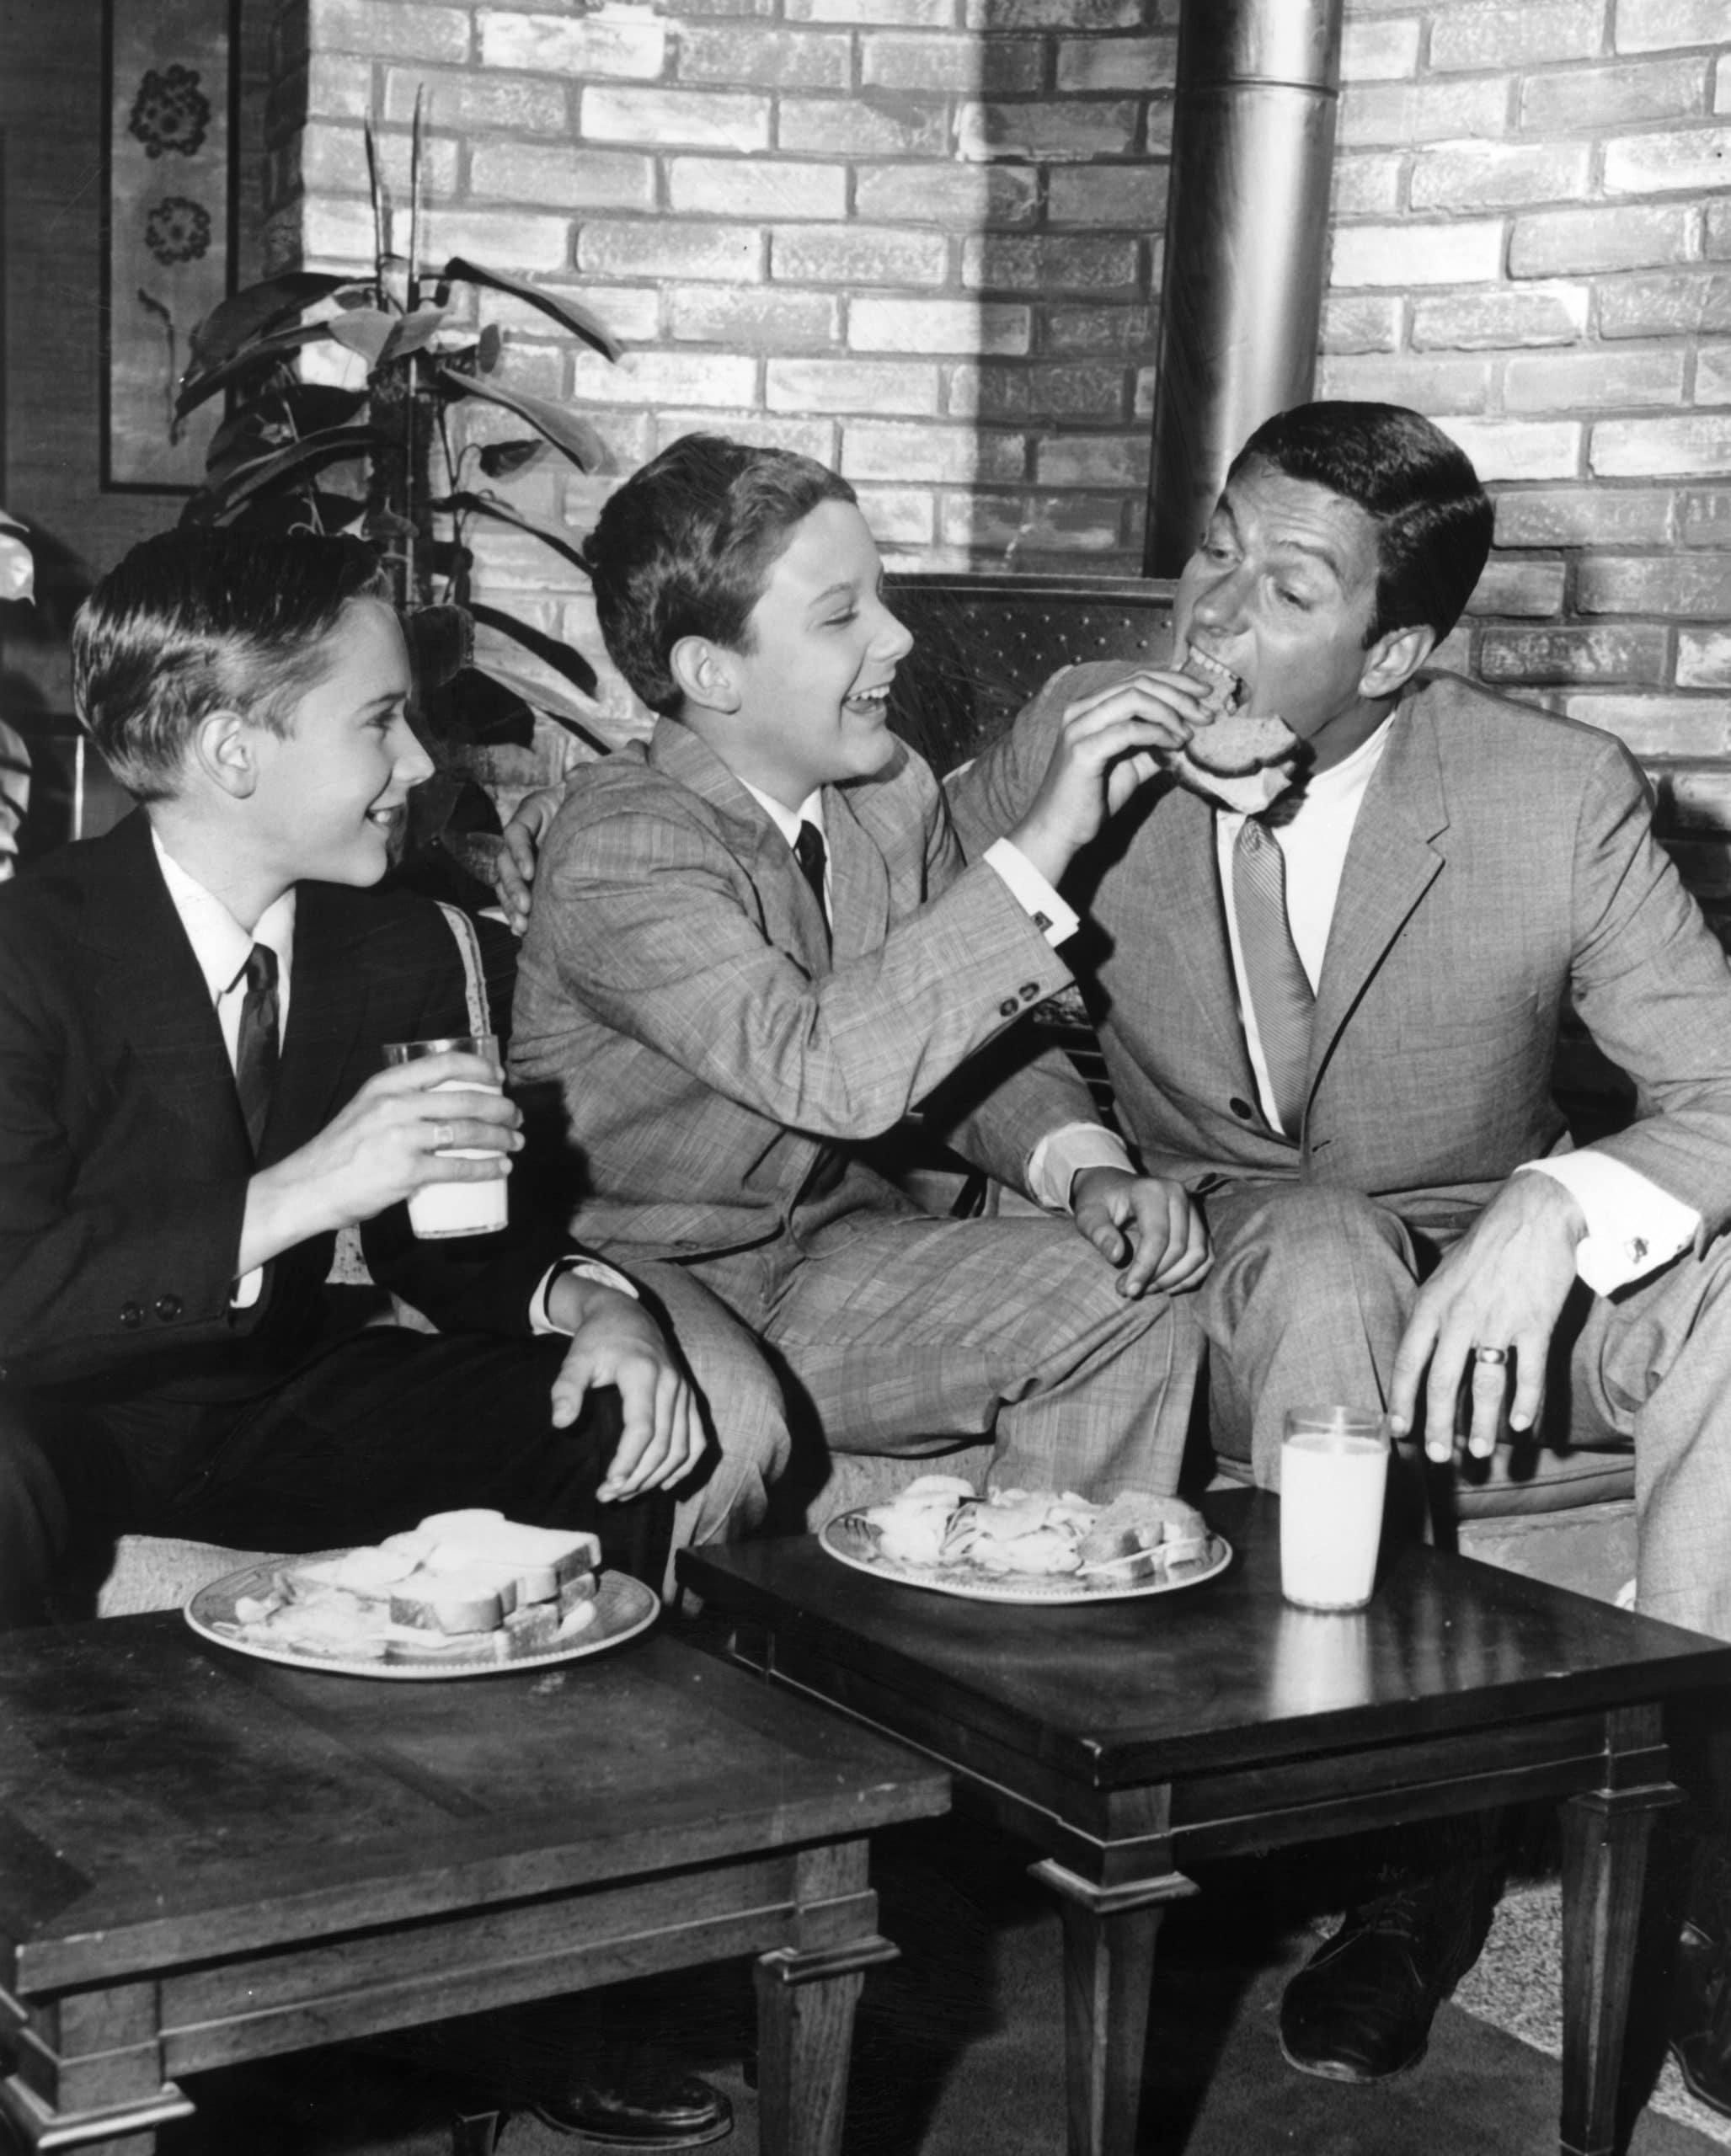 THE DICK VAN DYKE SHOW, Barry Van Dyke, Christian Van Dyke, Dick Van Dyke